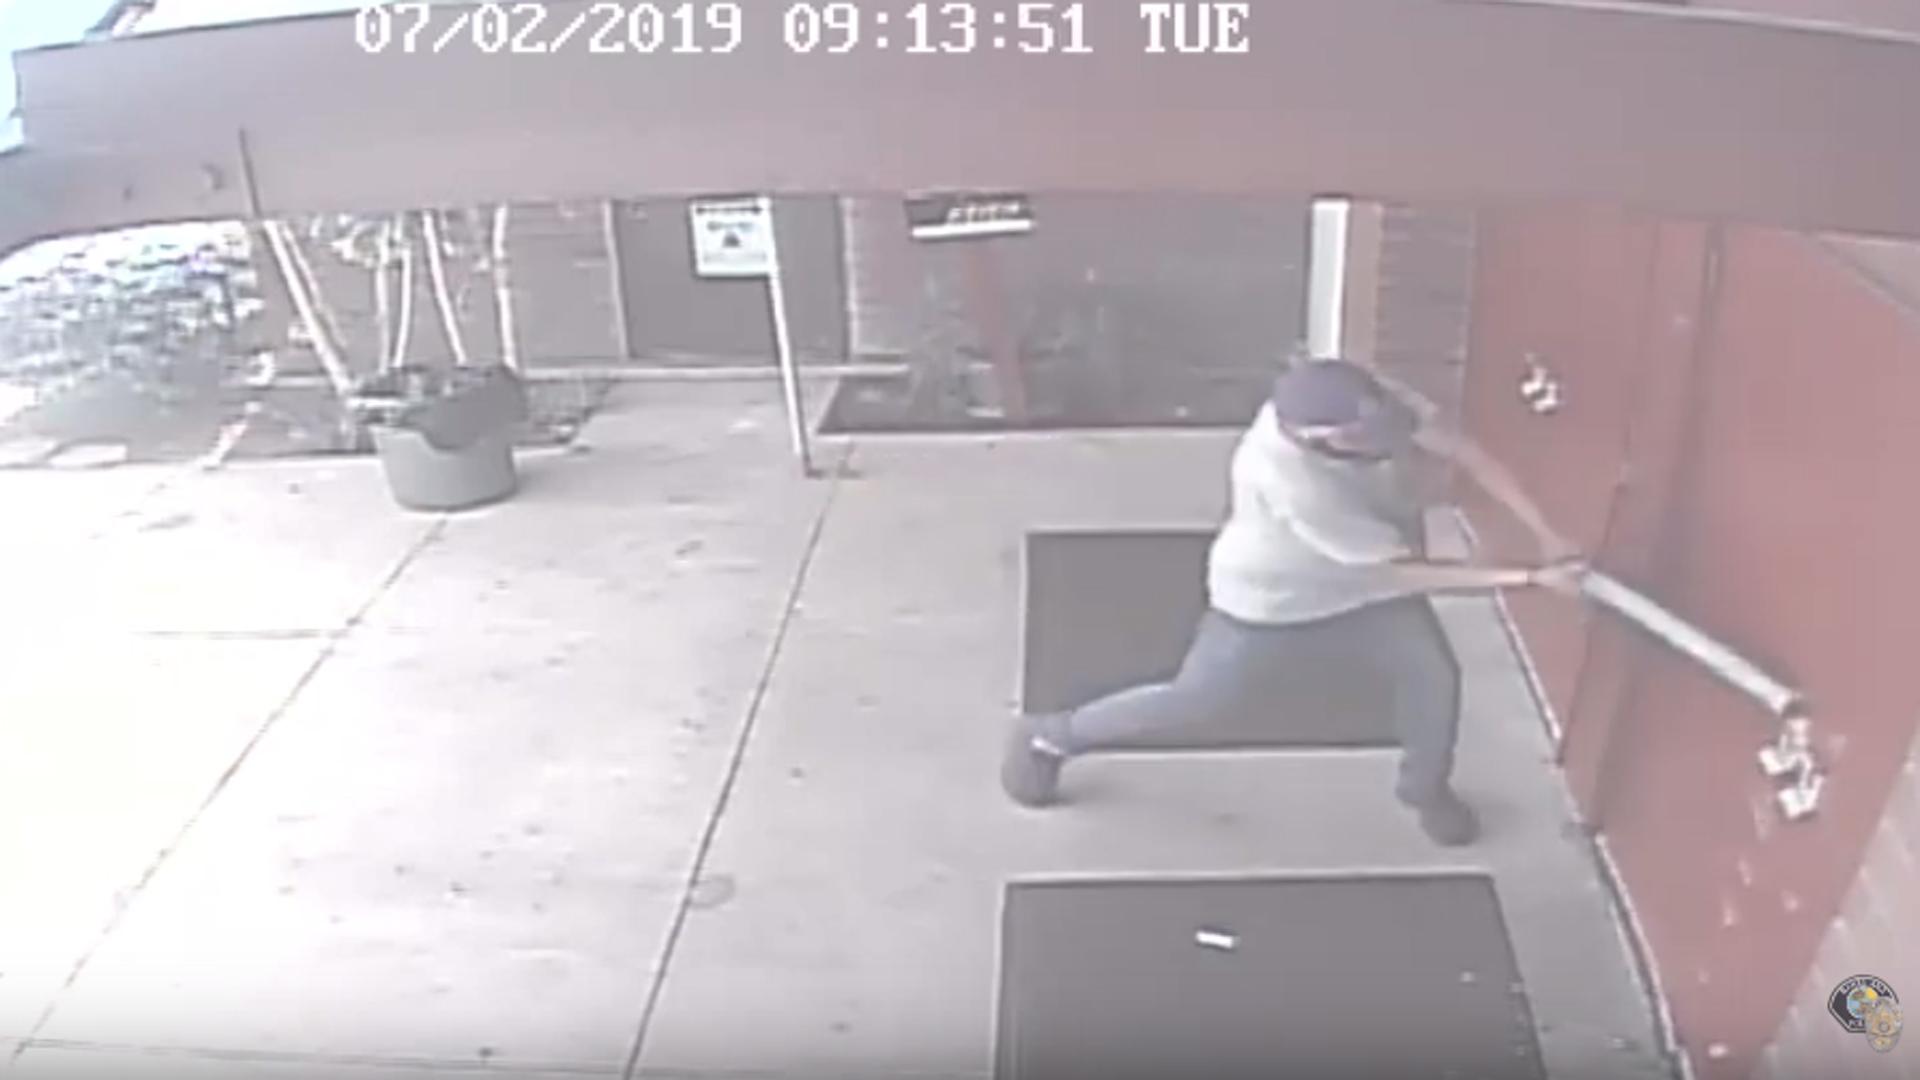 A man was caught on camera smashing open a Santa Ana church on July 2, 2019. (Credit: Santa Ana Police Department)